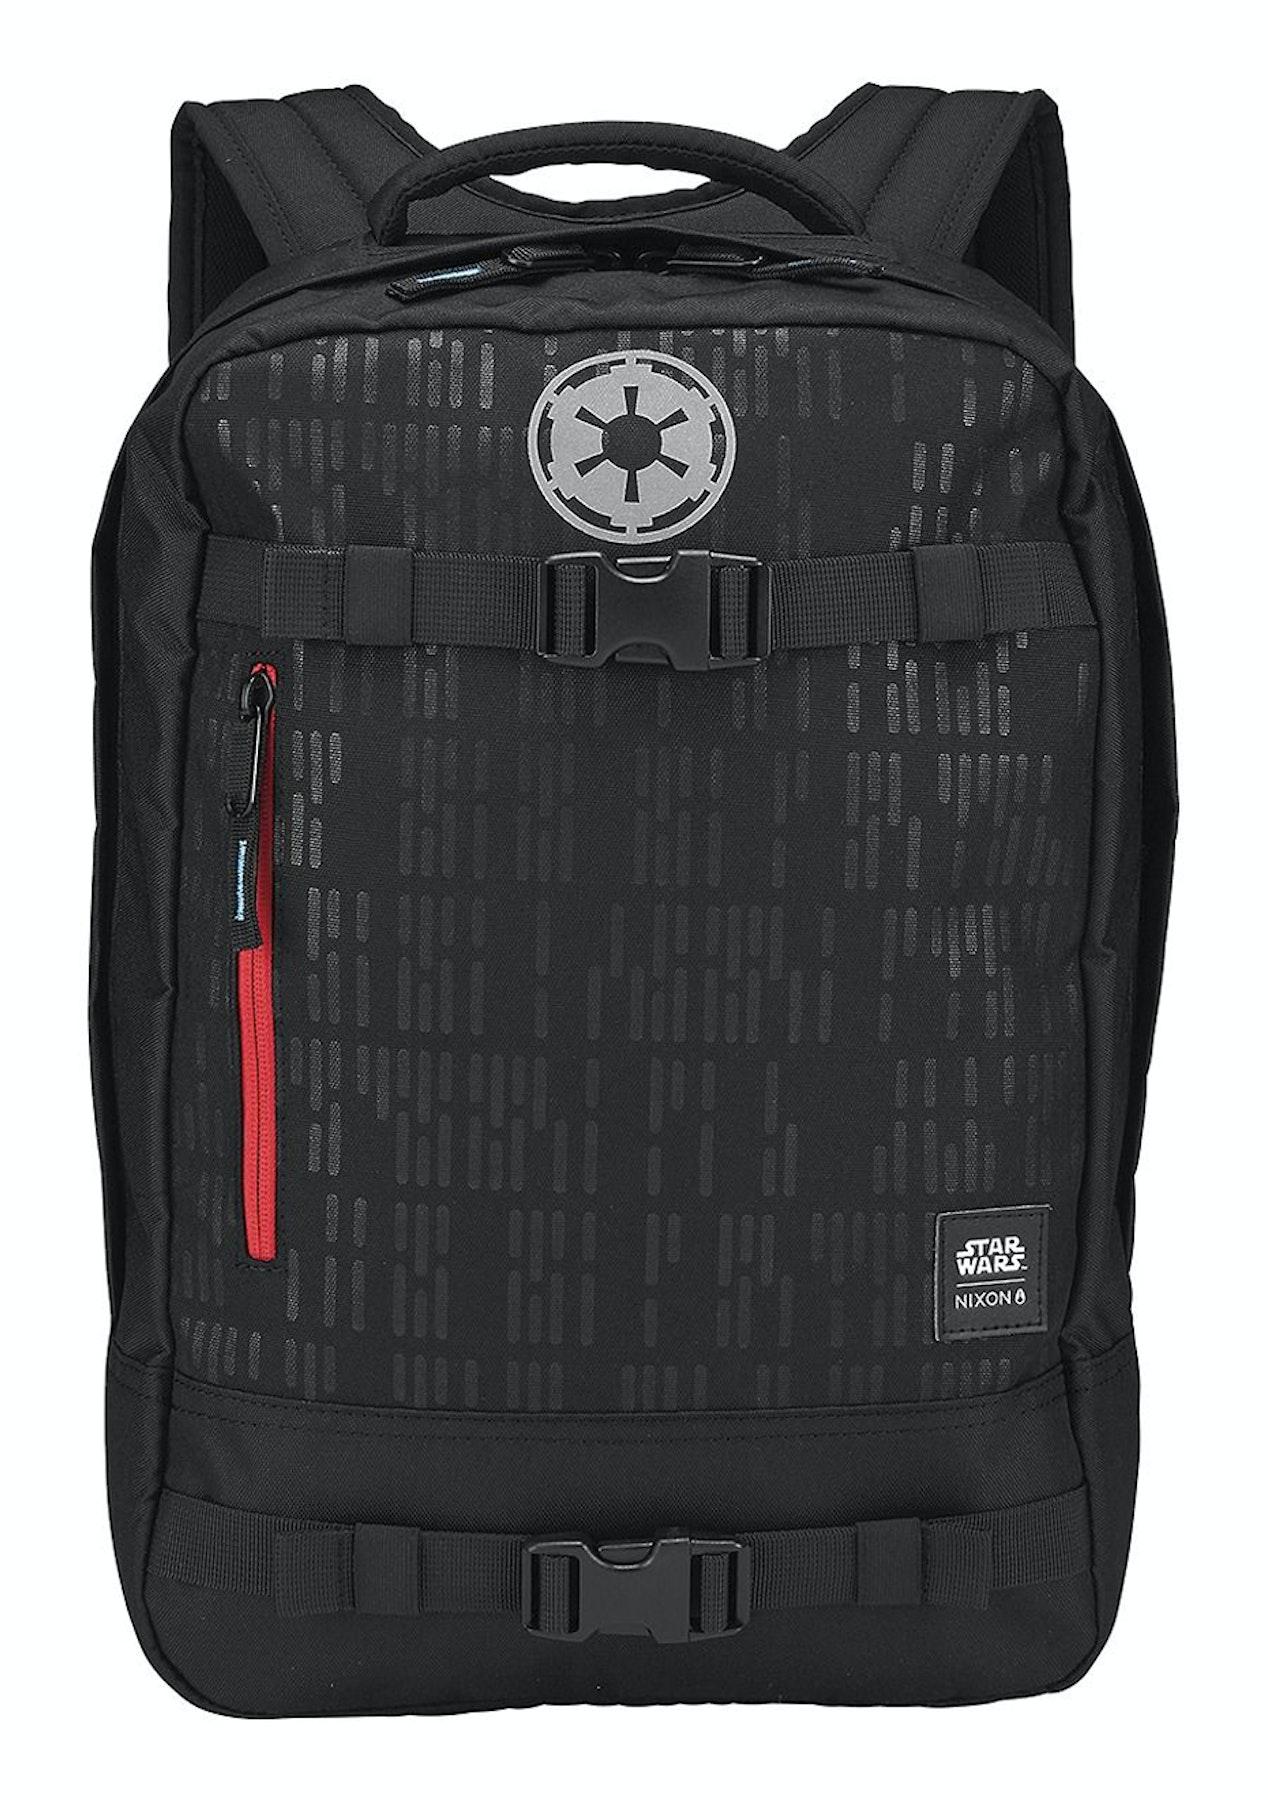 dbb20ddf7be Nixon Del Mar Backpack SW - Nixon Flash Sale - Onceit